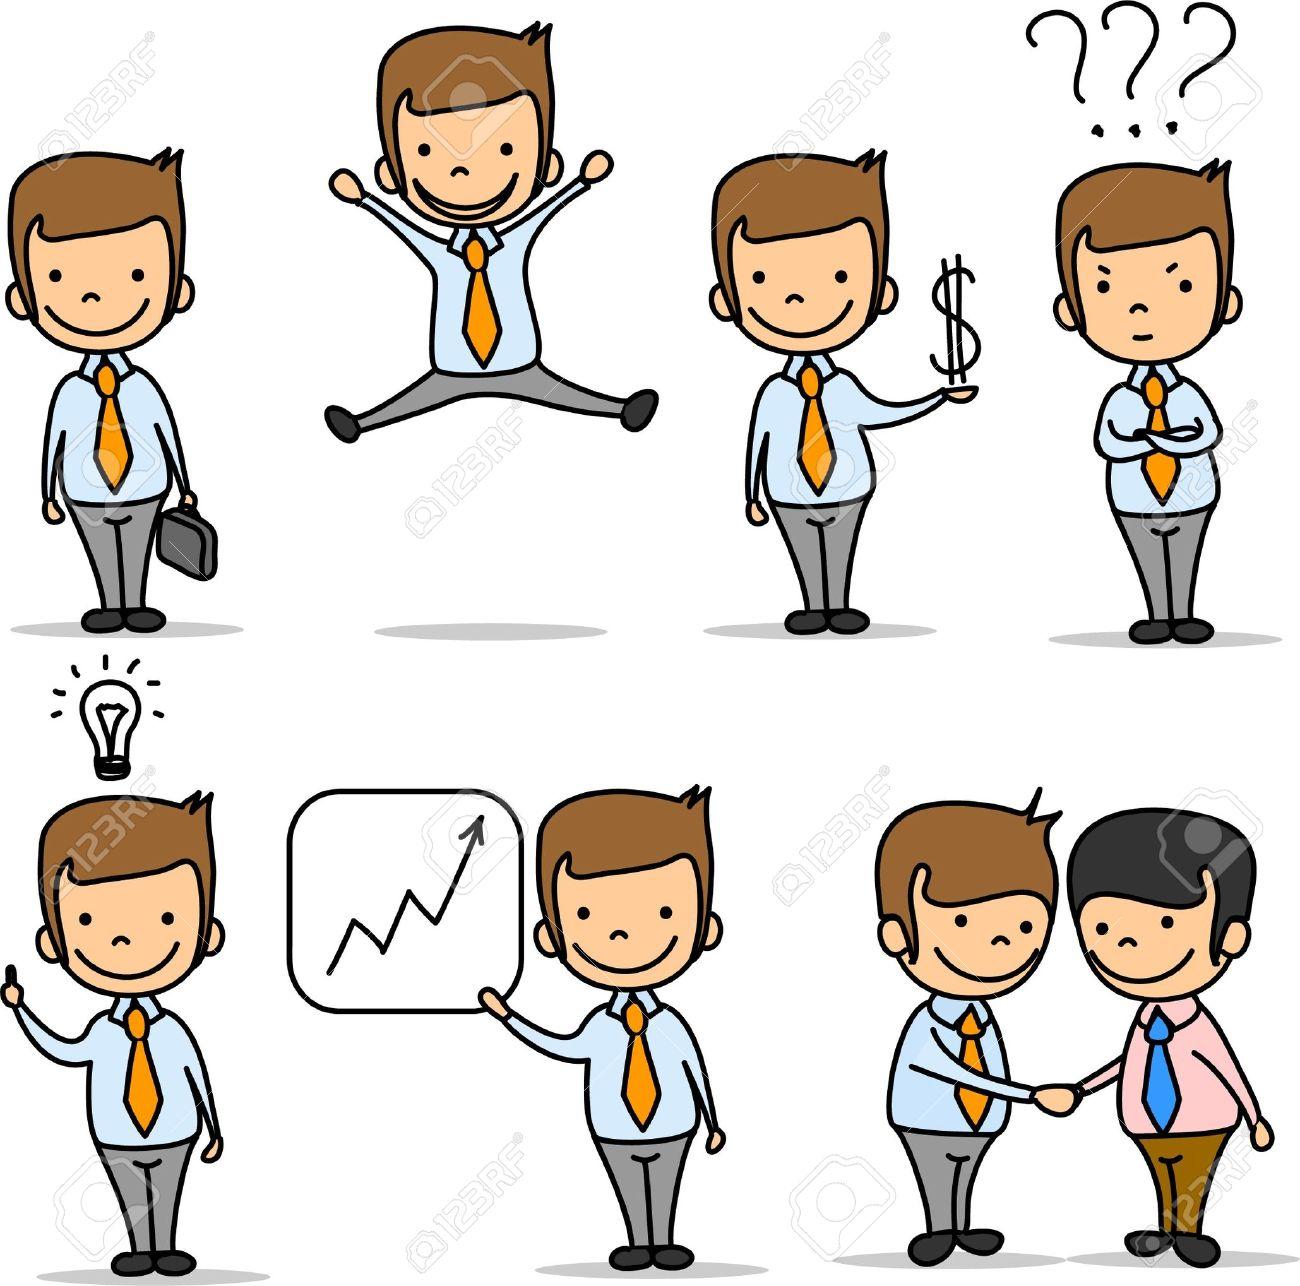 Business team cartoon characters cartoon vector cartoondealer com - Show Business Set Of Funny Cartoon Office Worker Illustration